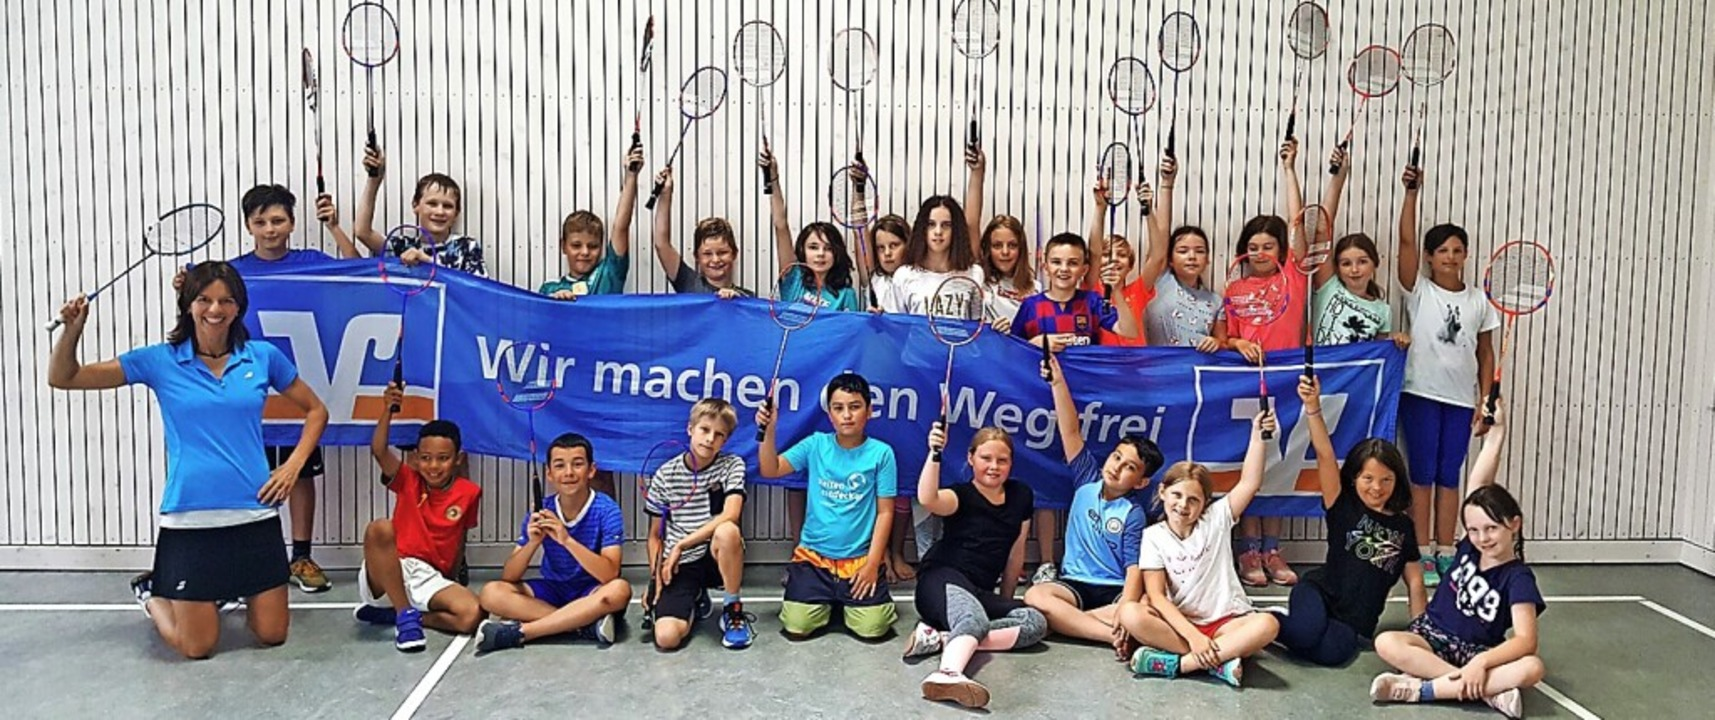 <BZ-FotoAnlauf>Badminton-Schultour:</B...chülern in Wiechs Freude an Bewegung.   | Foto: privat